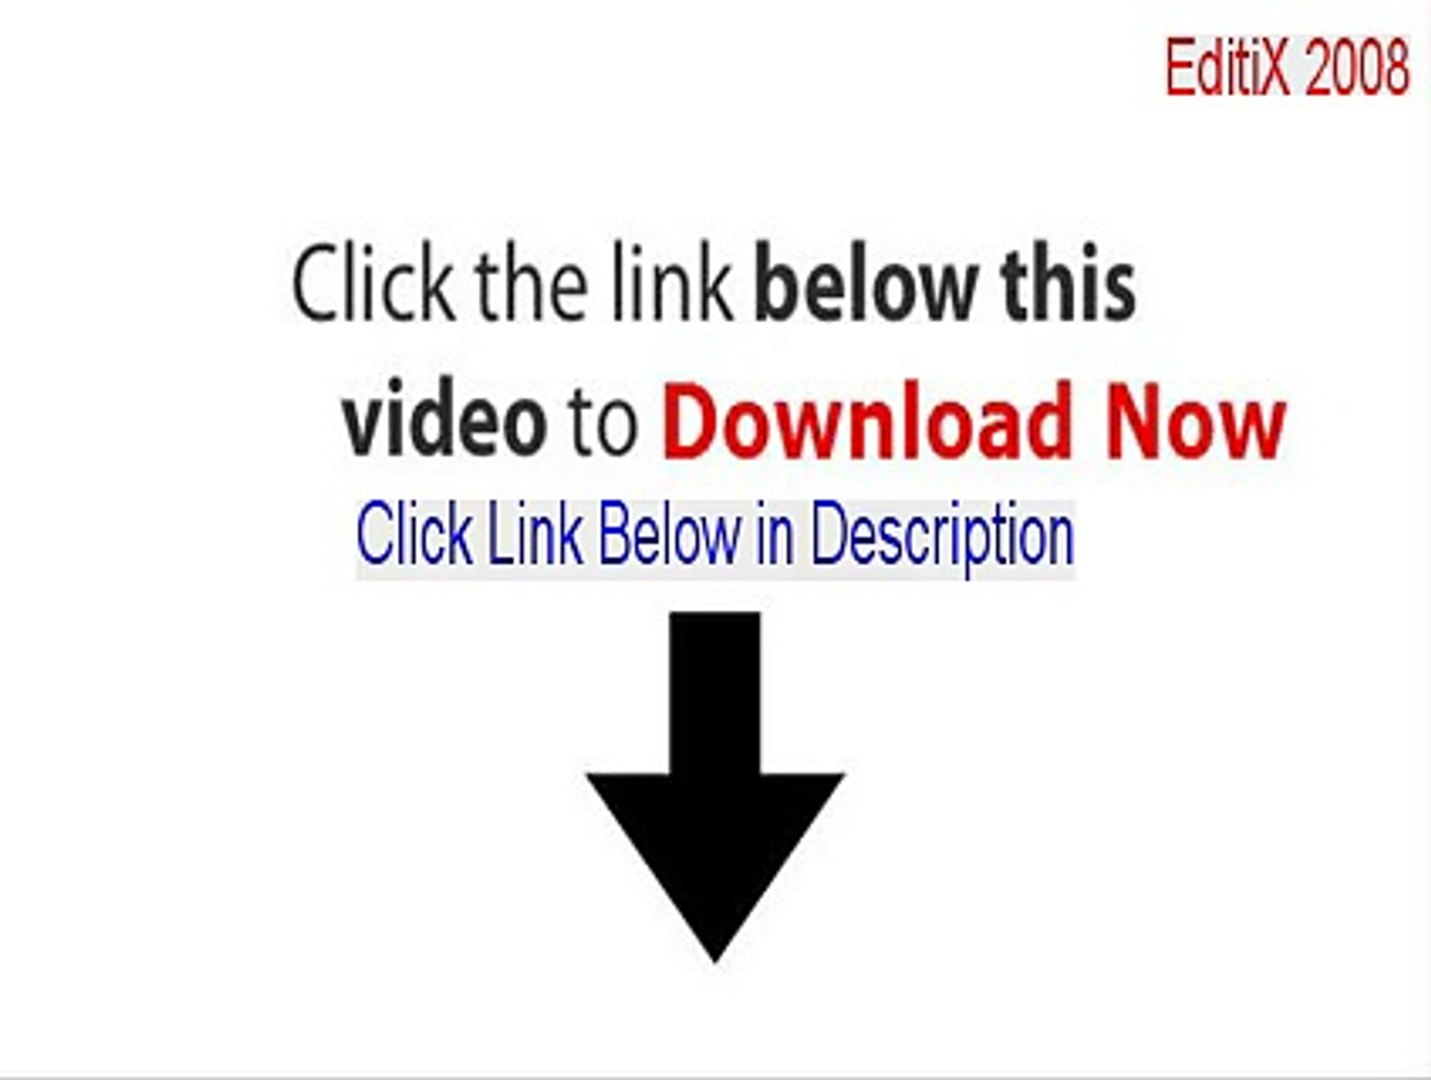 EditiX 2008 Crack - Instant Download [2015]